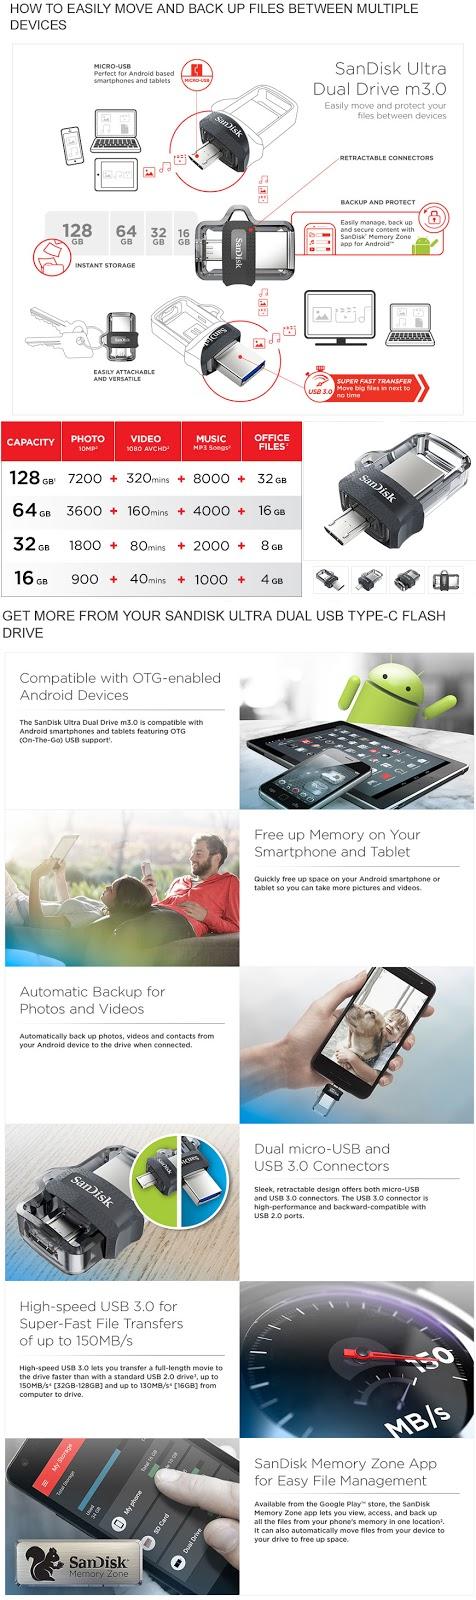 SanDisk USB OTG jimatkan memori android smartphone